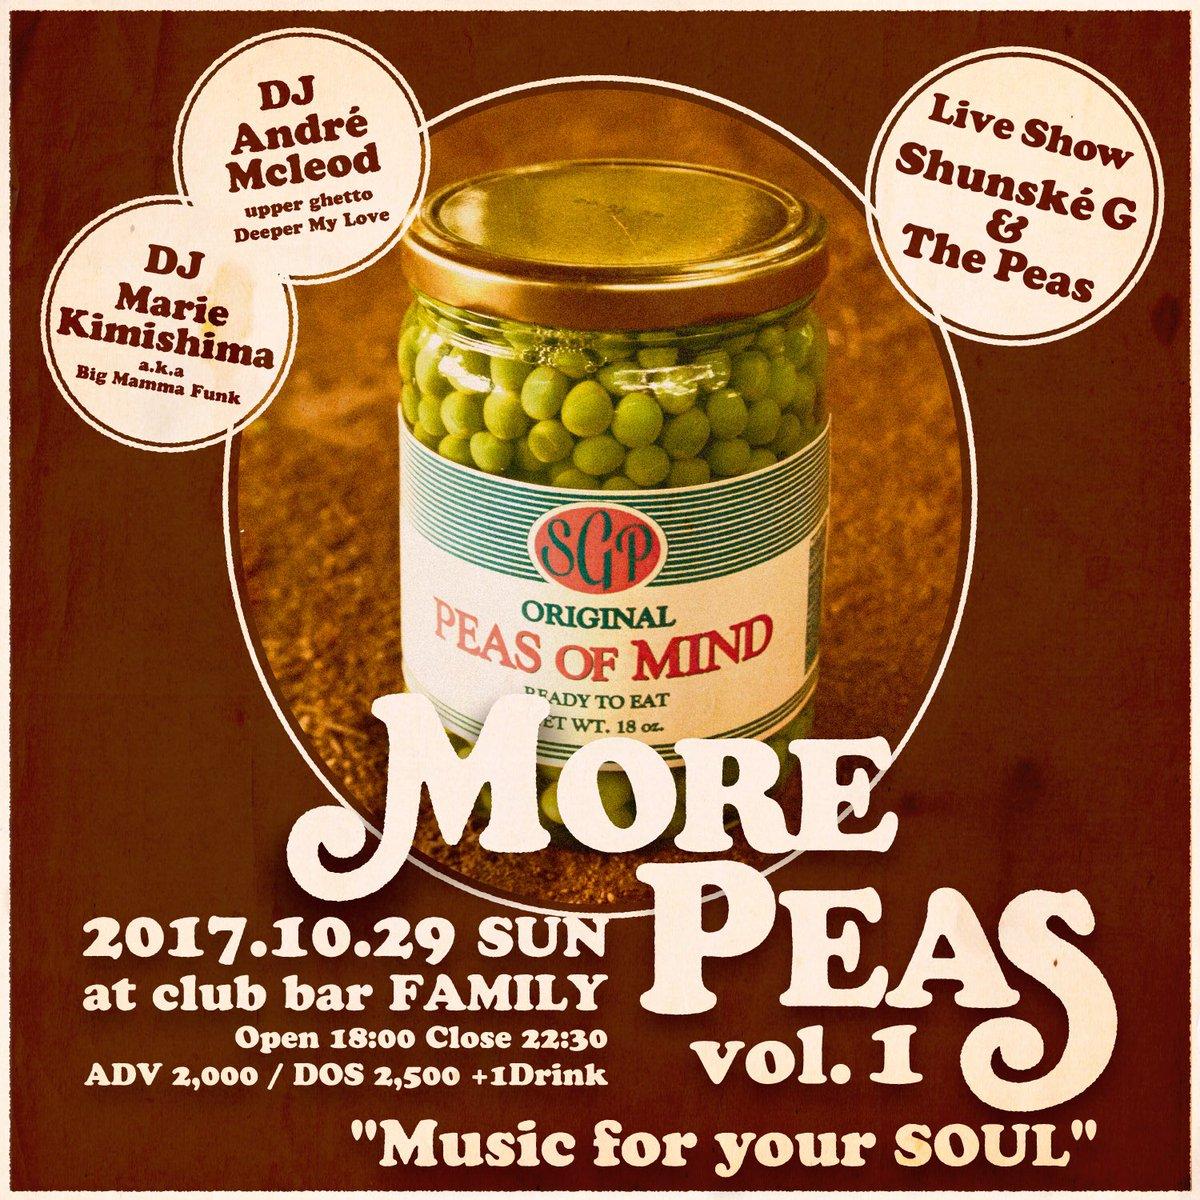 Shunské G & The Peas on Twitter: